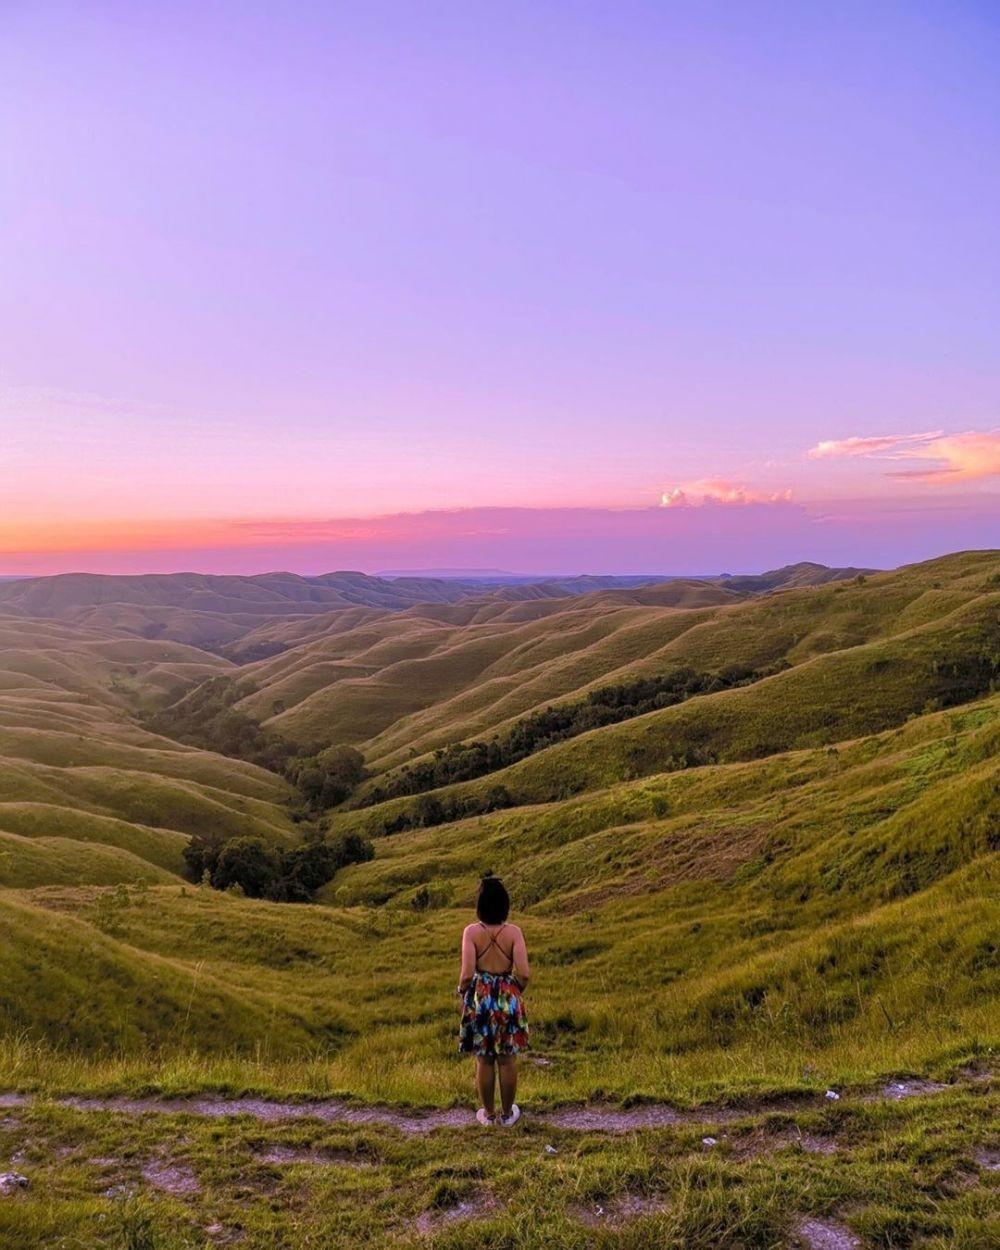 10 Wisata Bukit di Indonesia Tengah dan Timur, Indahnya Bikin Terpana